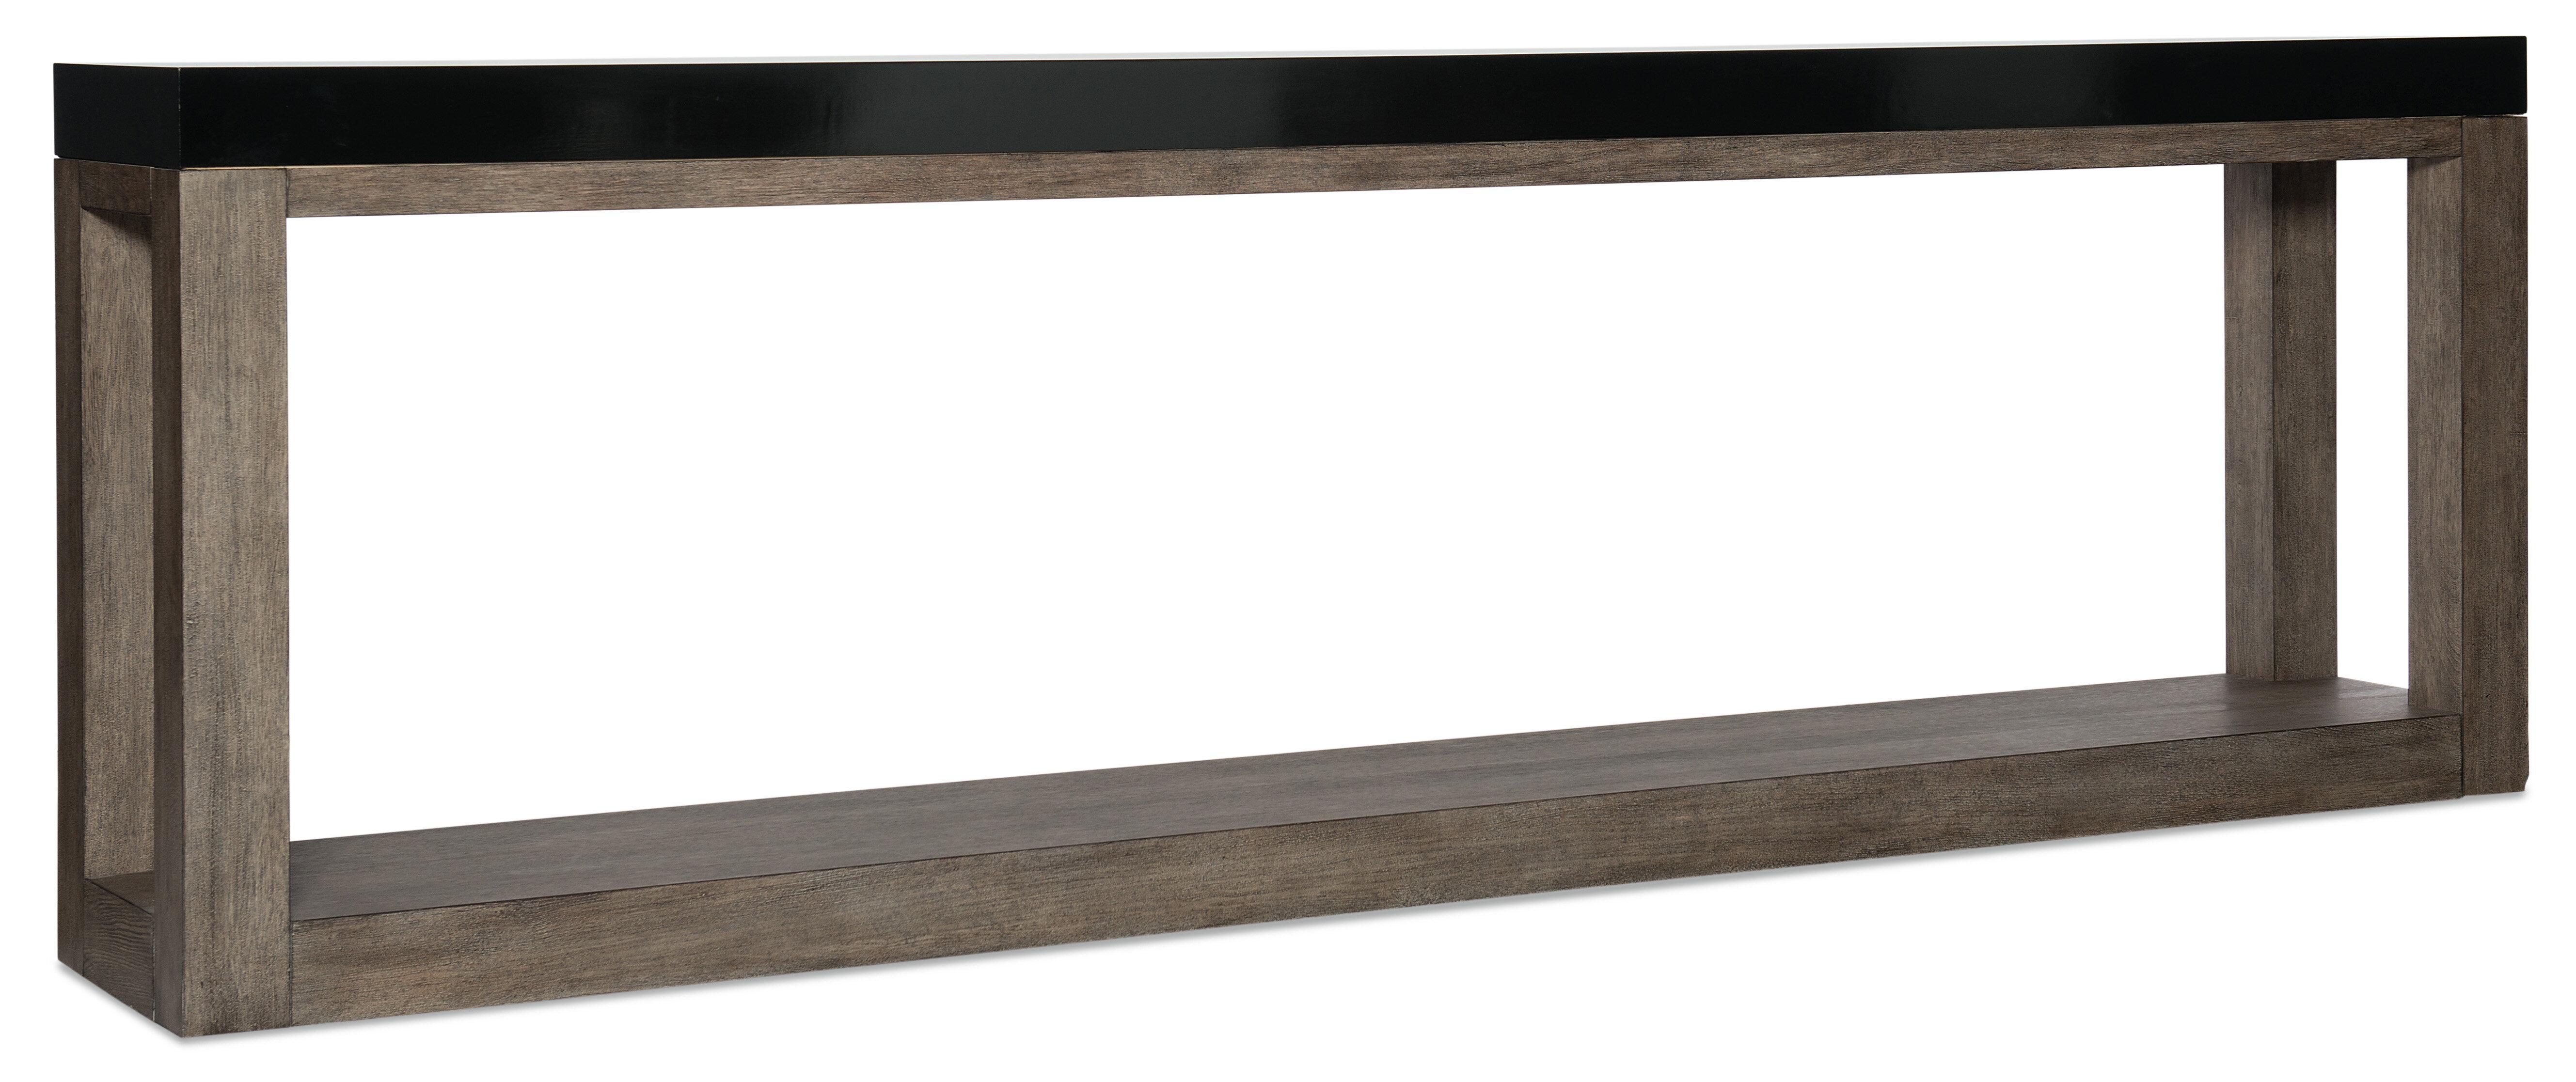 Hooker Furniture Melange 105 Console Table Reviews Wayfair